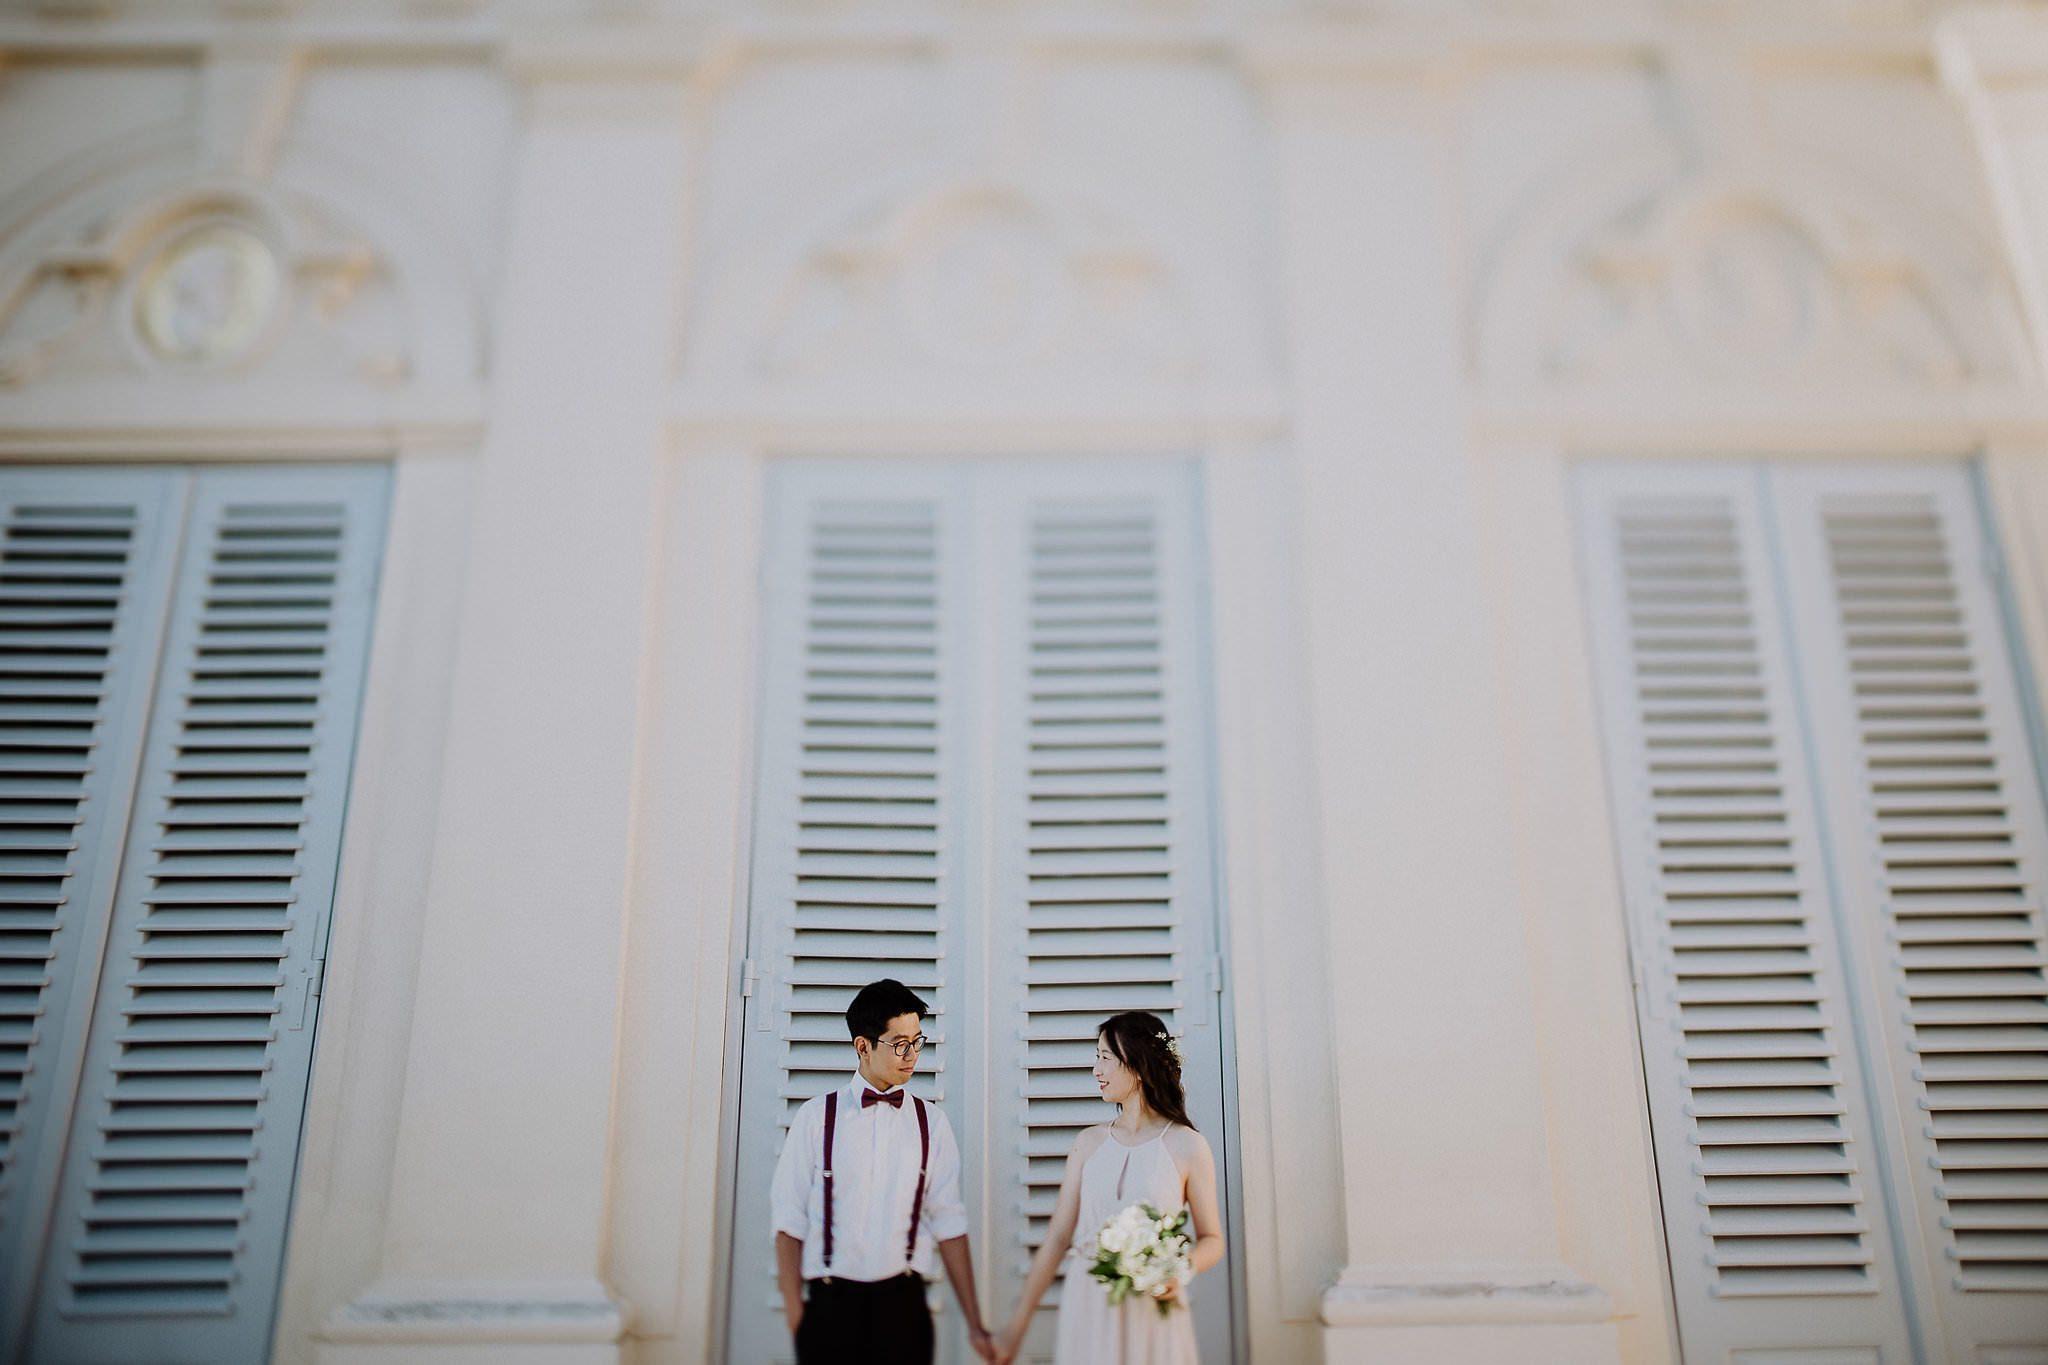 wedding photographer hamilton new zealand 1008 6